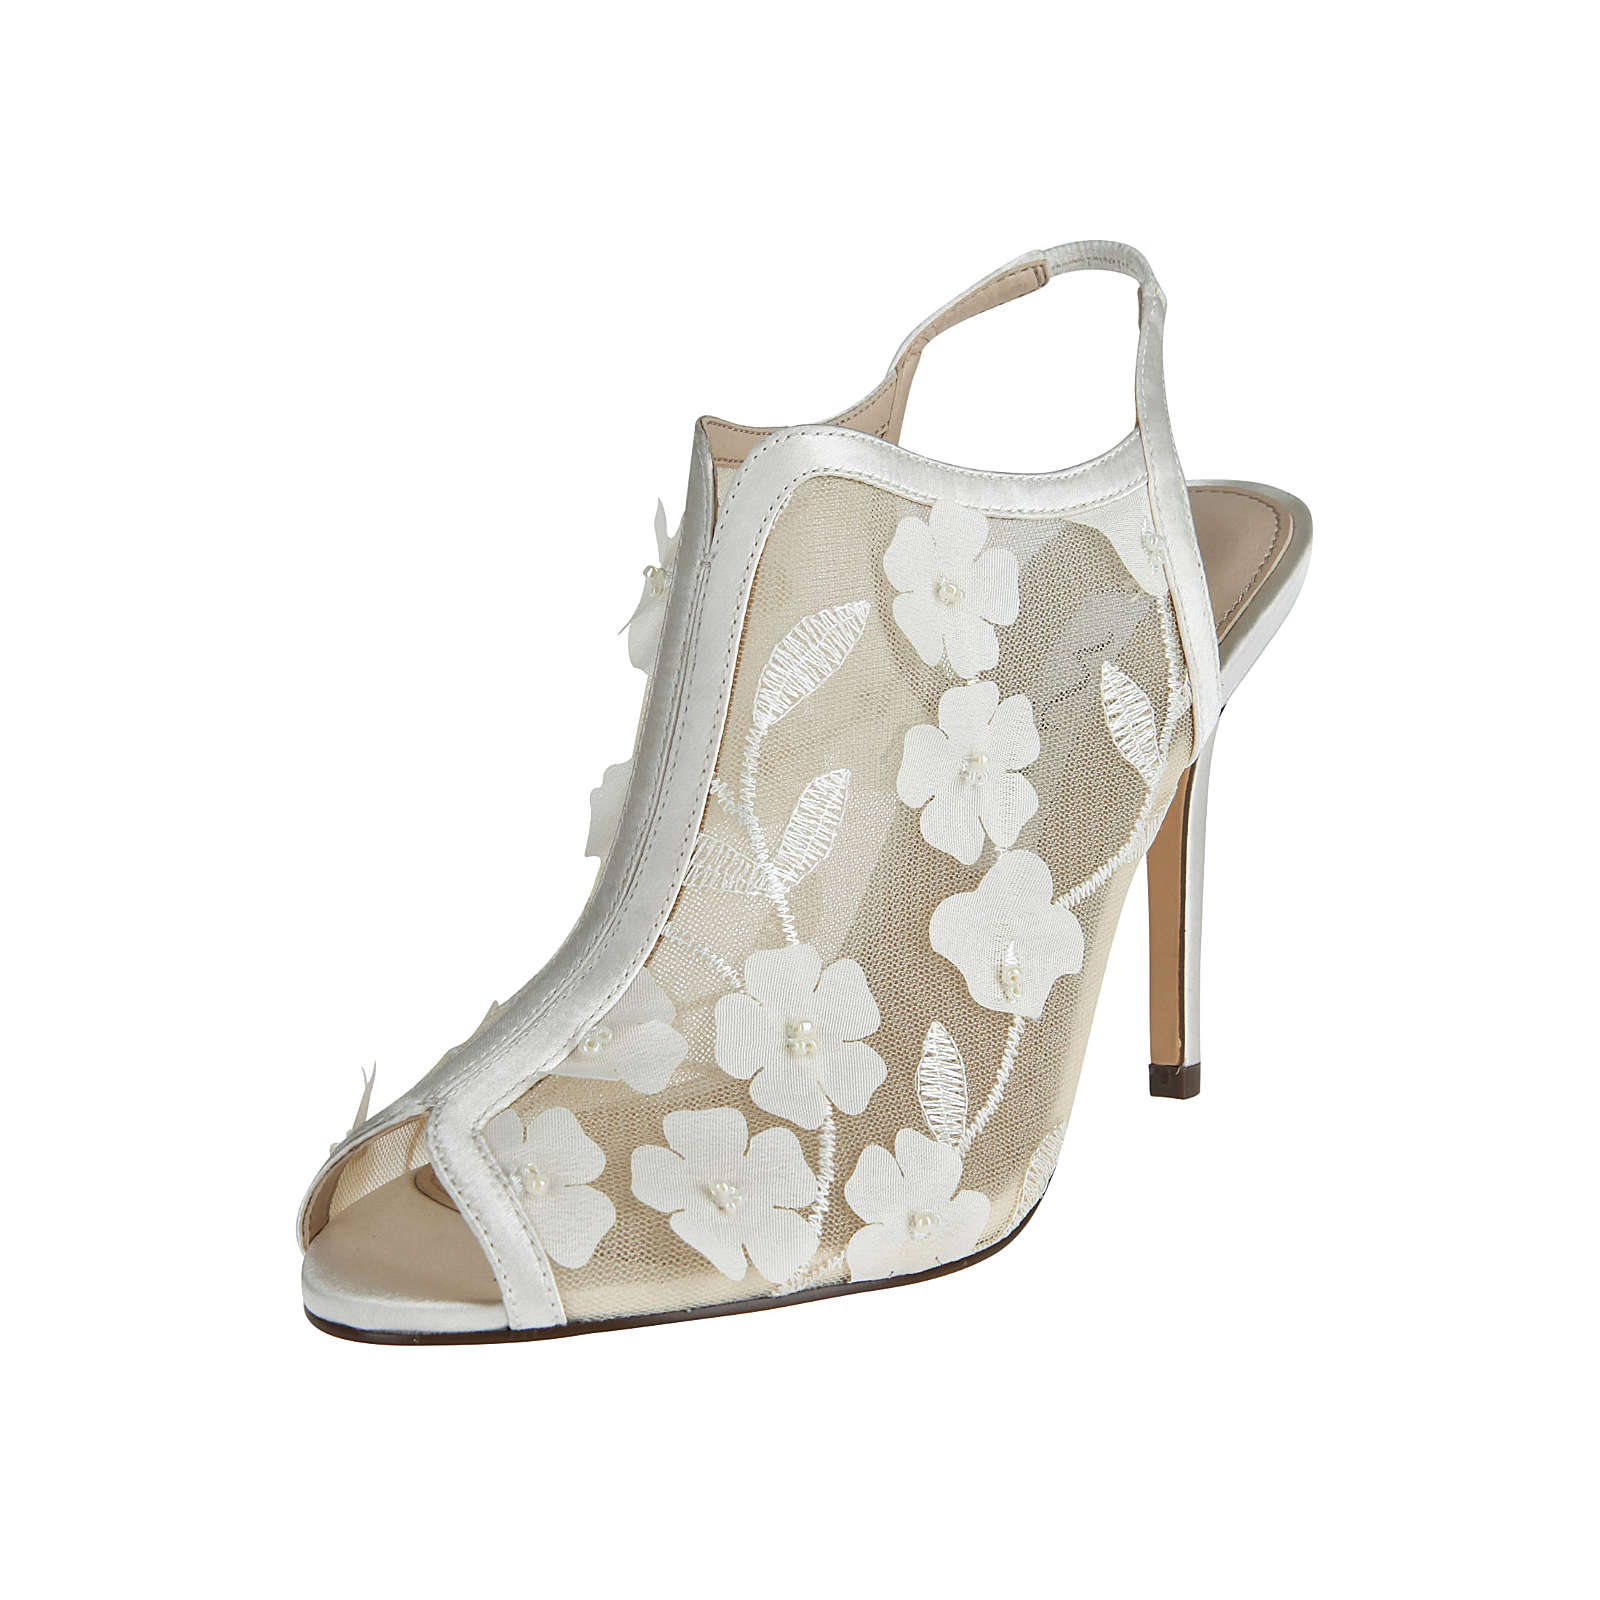 Nina Shoes High-Heel MEGGIN Klassische Pumps creme Damen Gr. 36